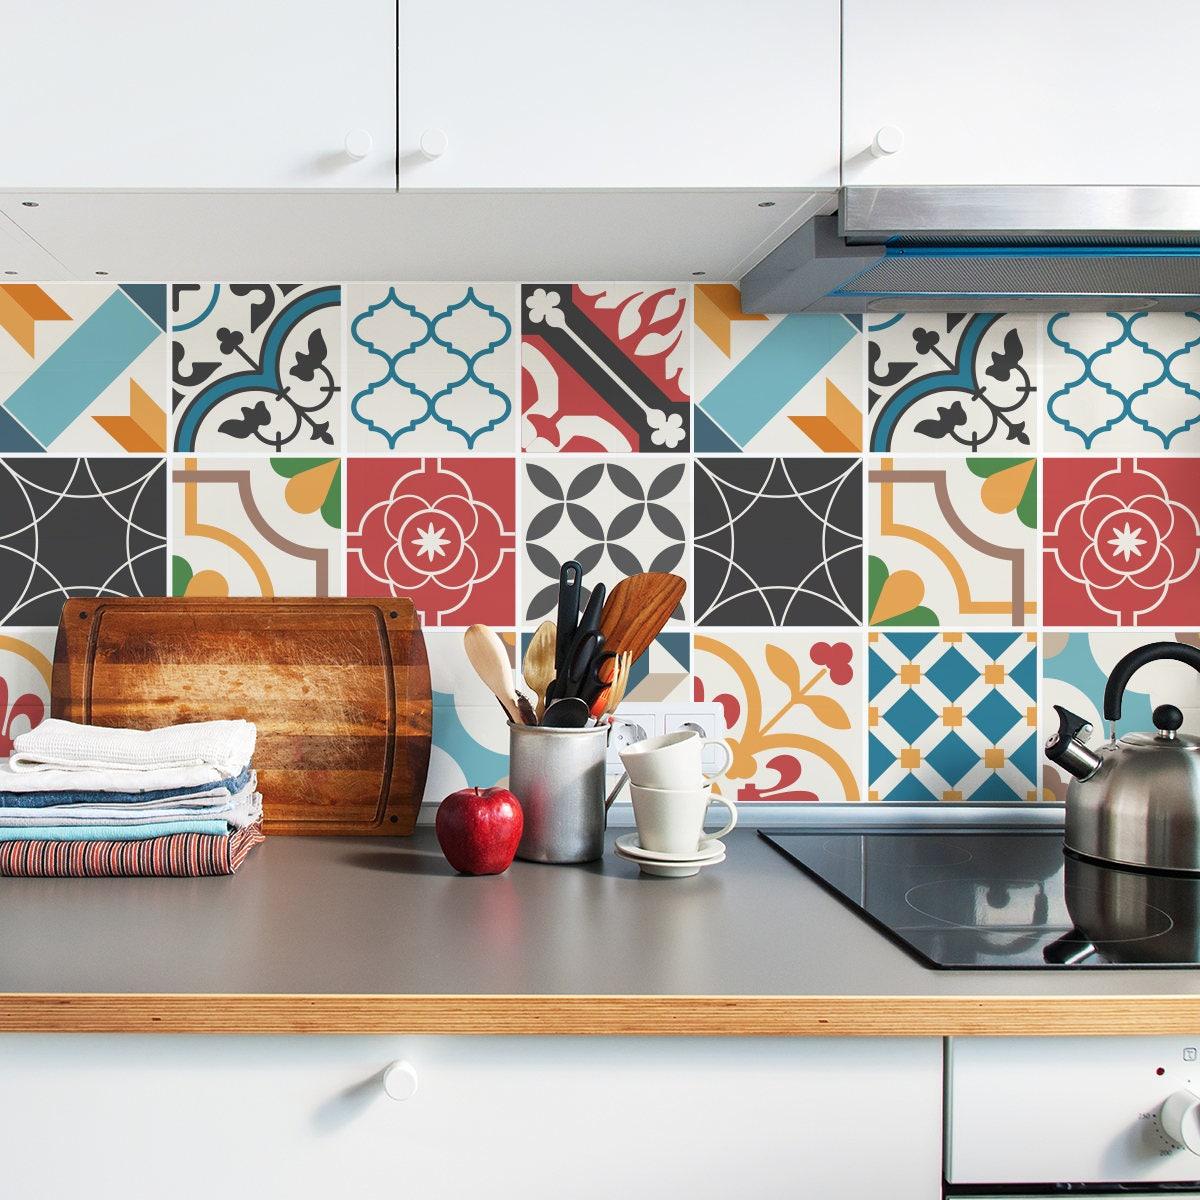 Talavera tile decals tile stickers set talavera spanish mediterranean tile decals tile stickers set traditional tiles kit tiles for kitchen dailygadgetfo Images